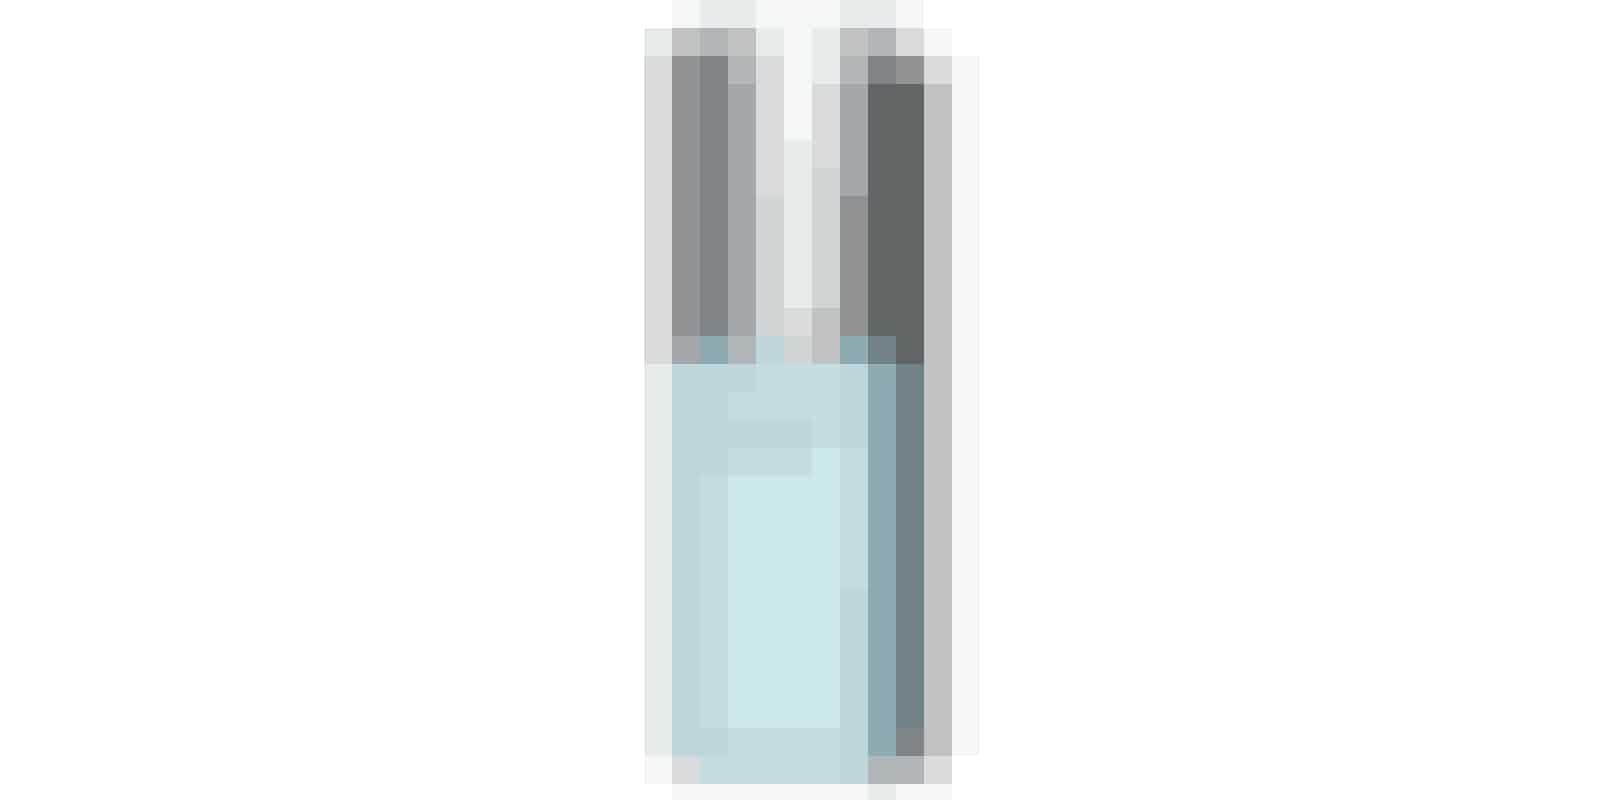 Men Hydro Master Gel, Shiseido, 75 ml, 340 kr.Købes online HER